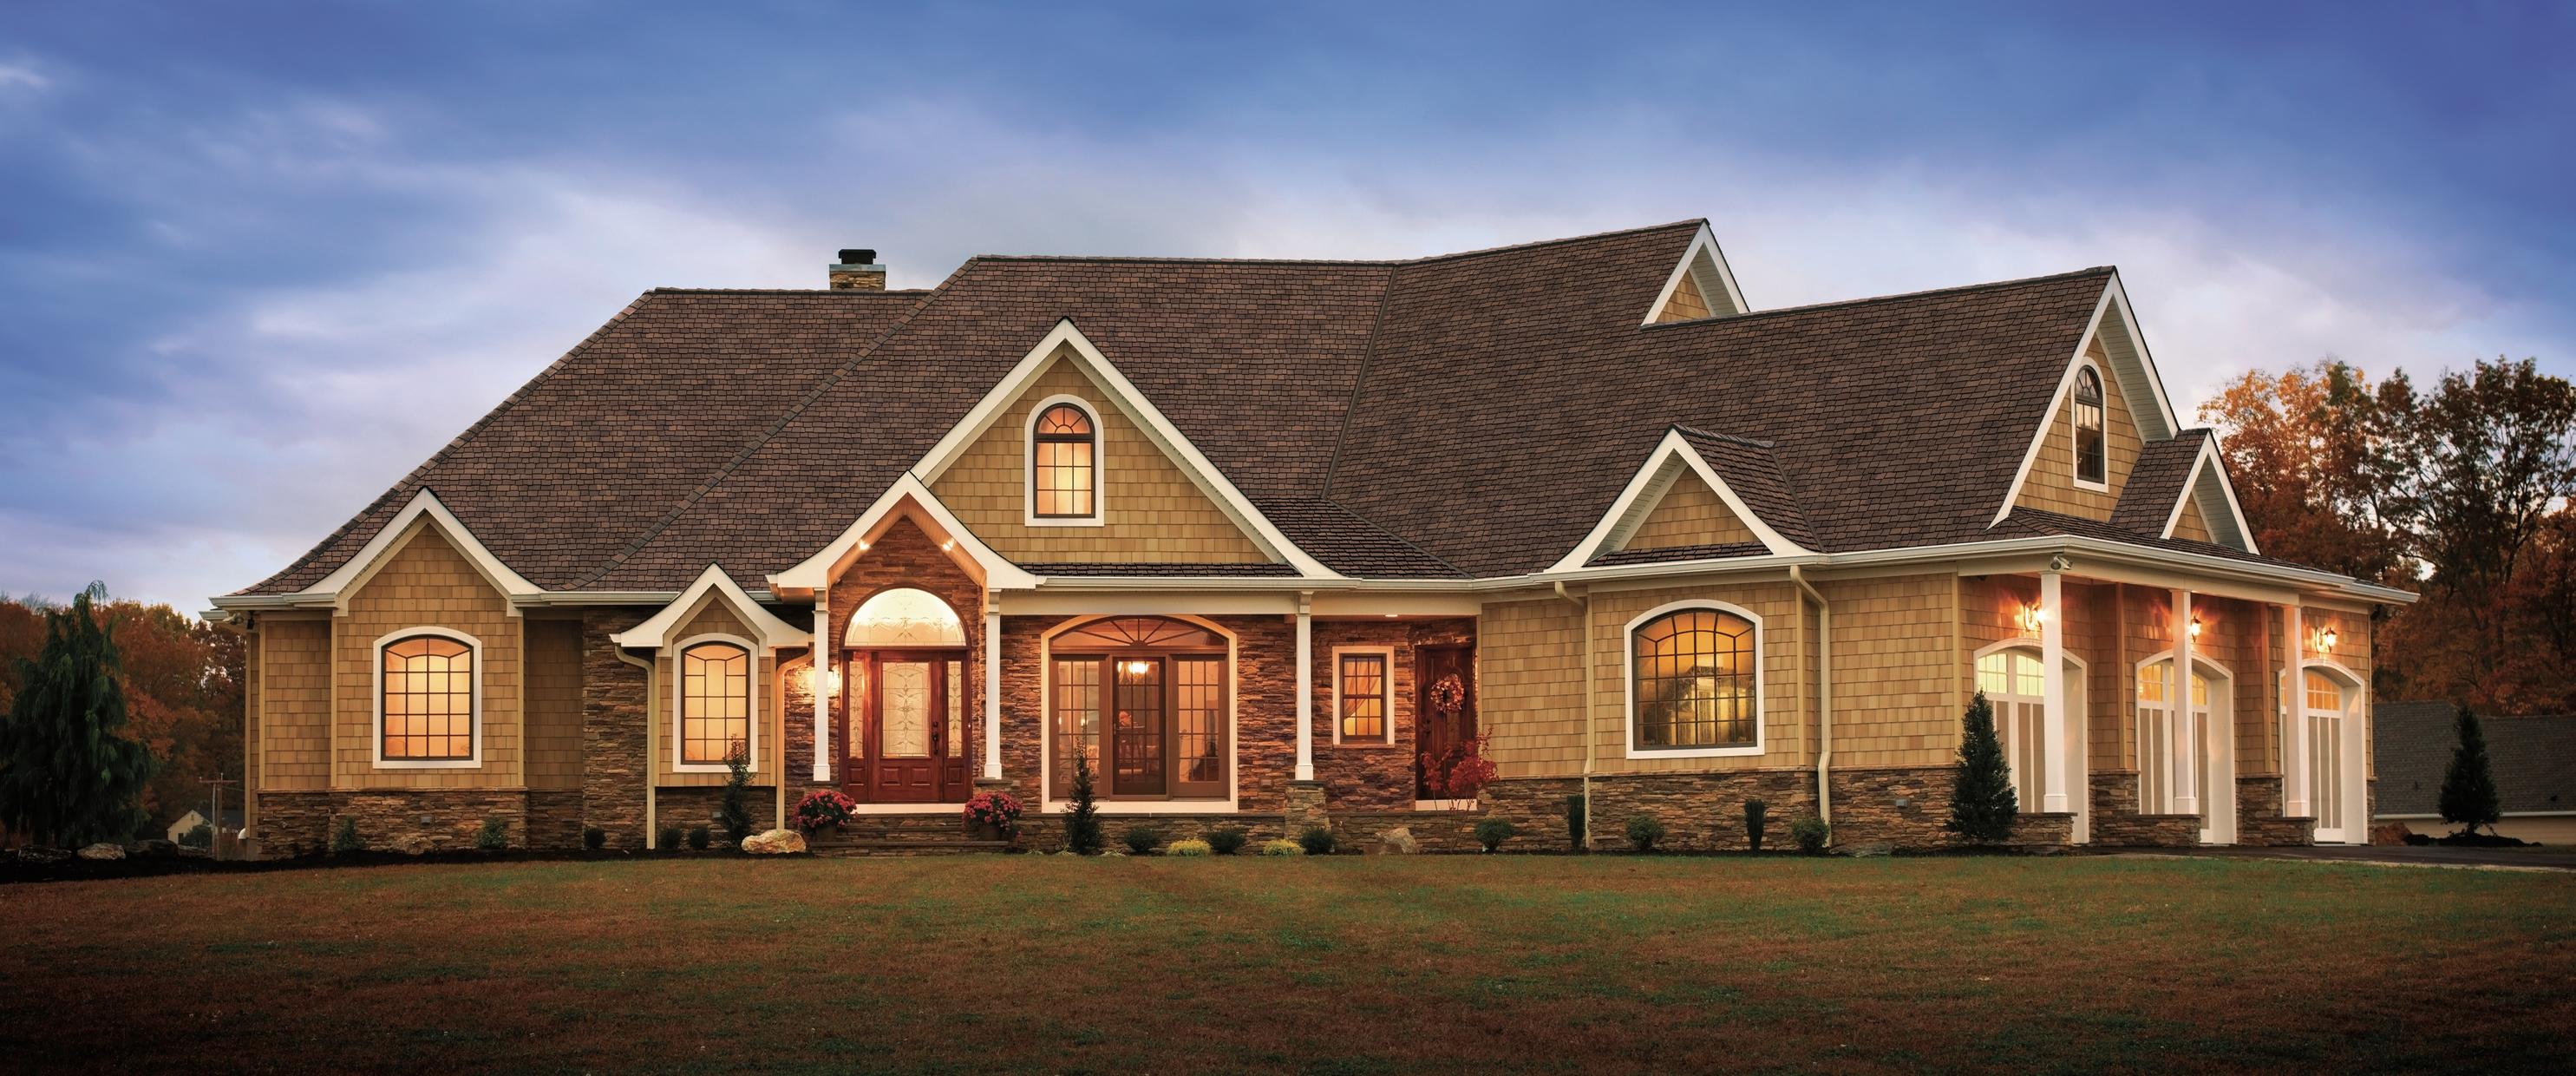 Best Roofing Contractors Minneapolis Gaf Roof Cost Roof 400 x 300